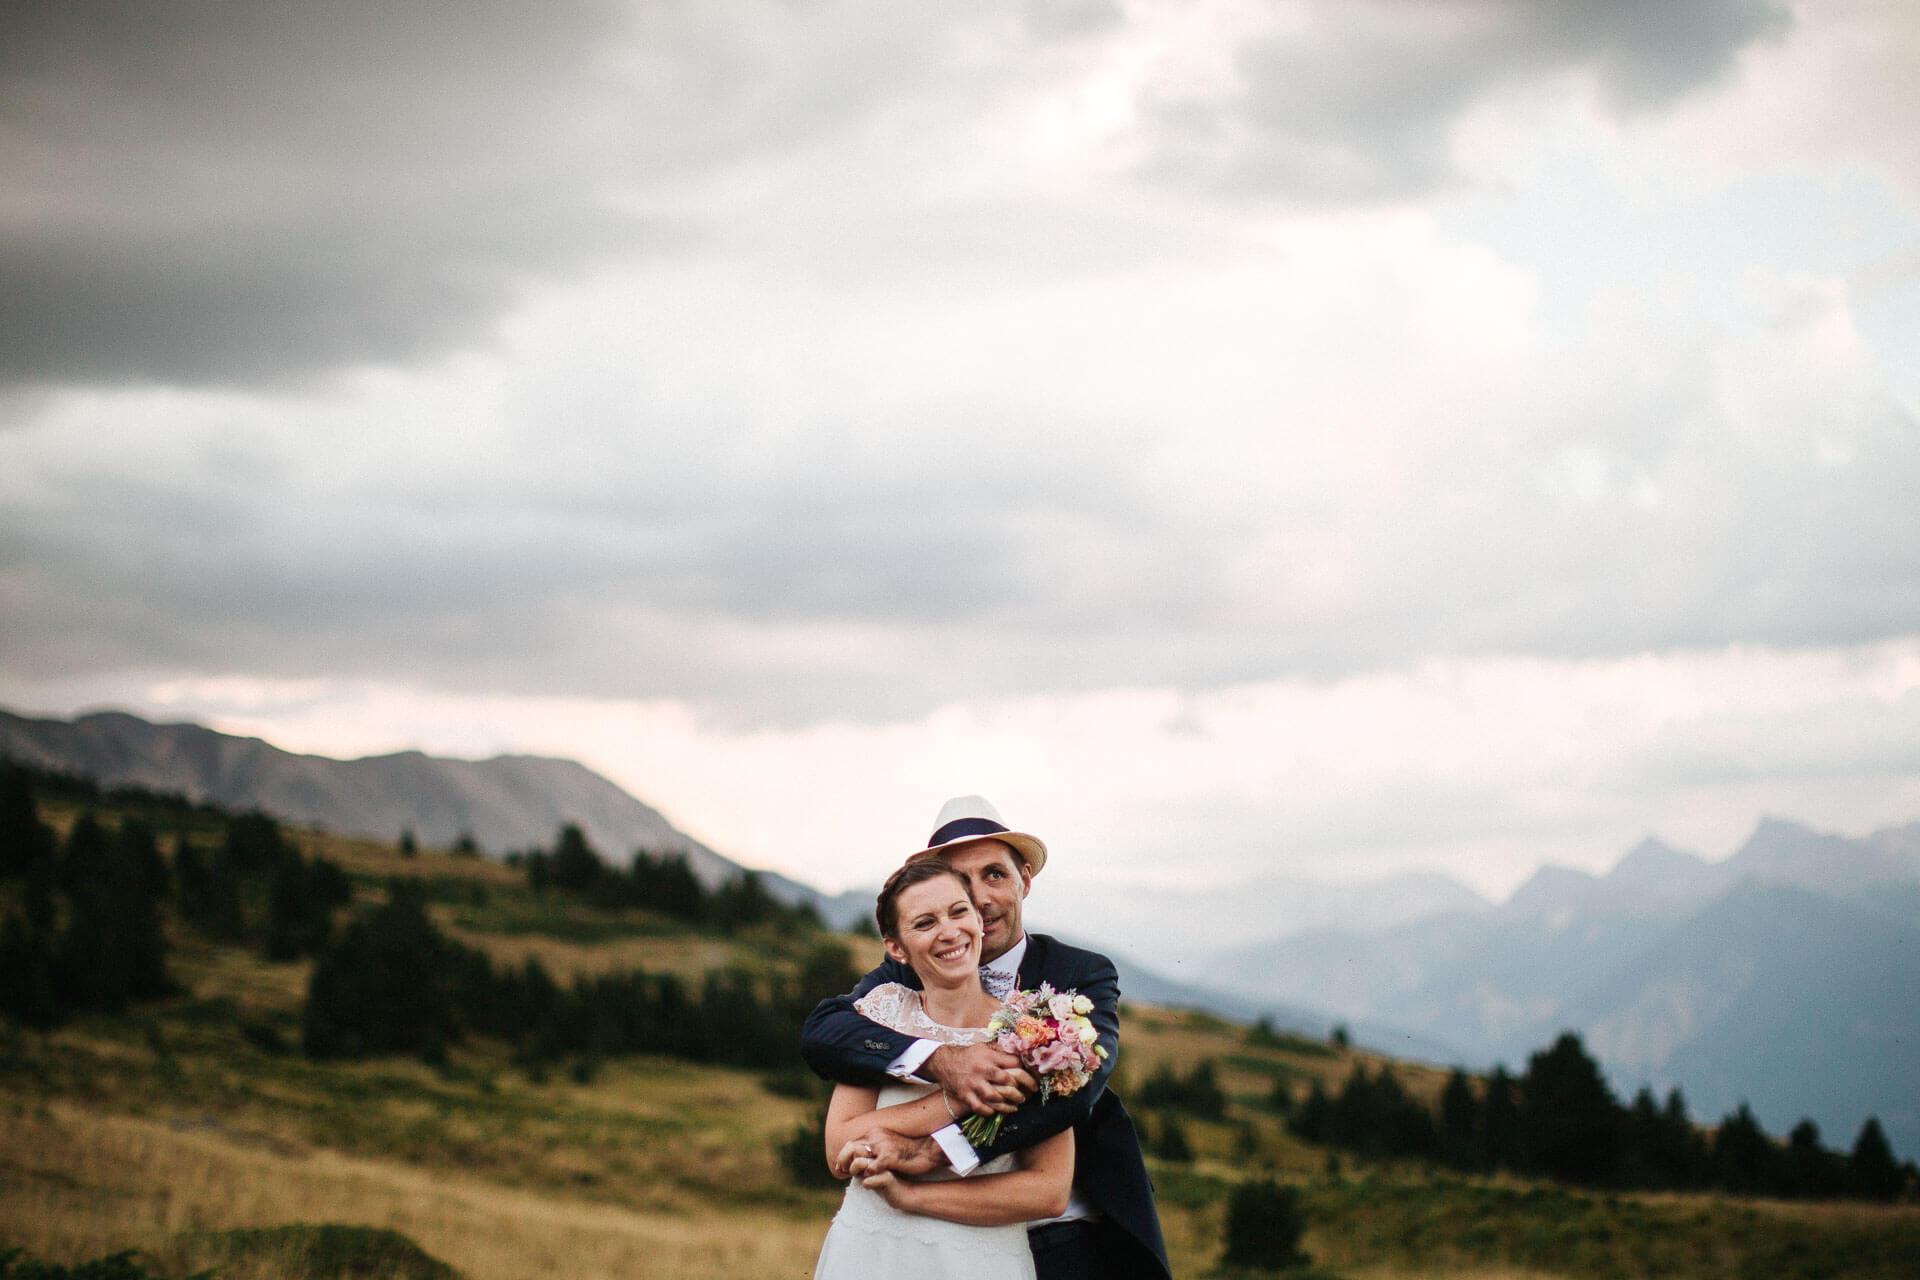 photographe-mariage-alpes-montagne-15